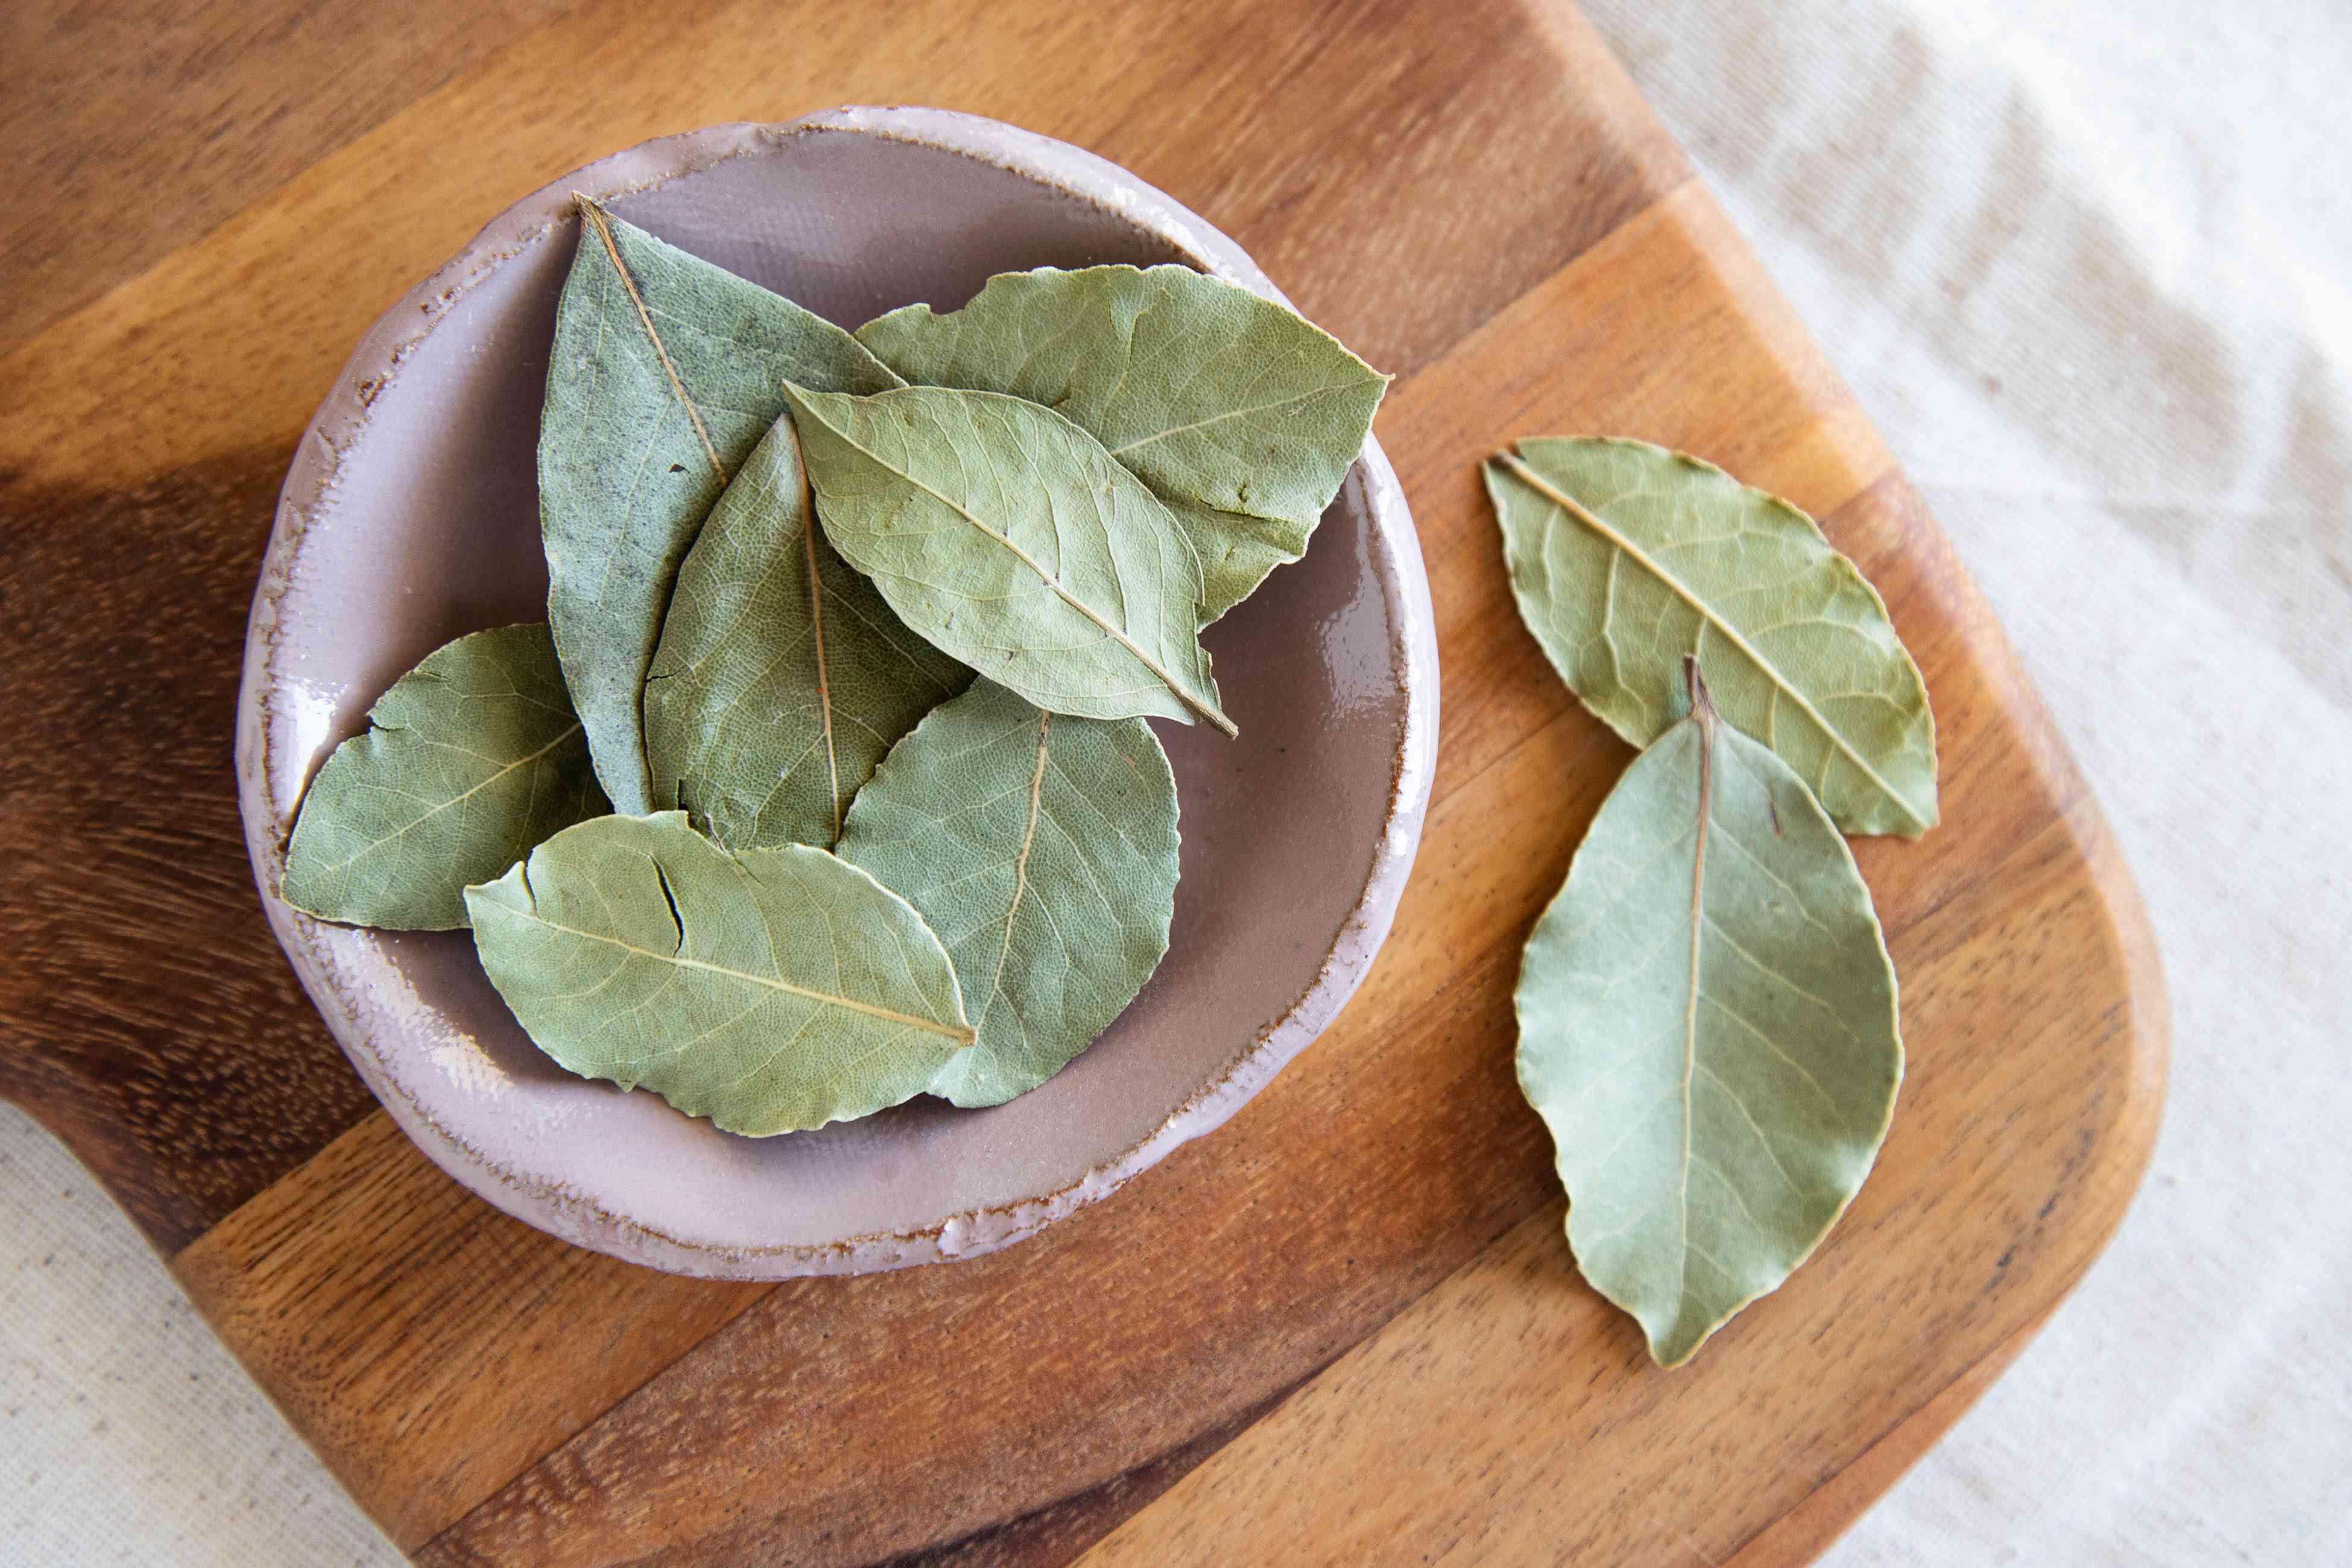 Fried bay leaves in lavender bowl